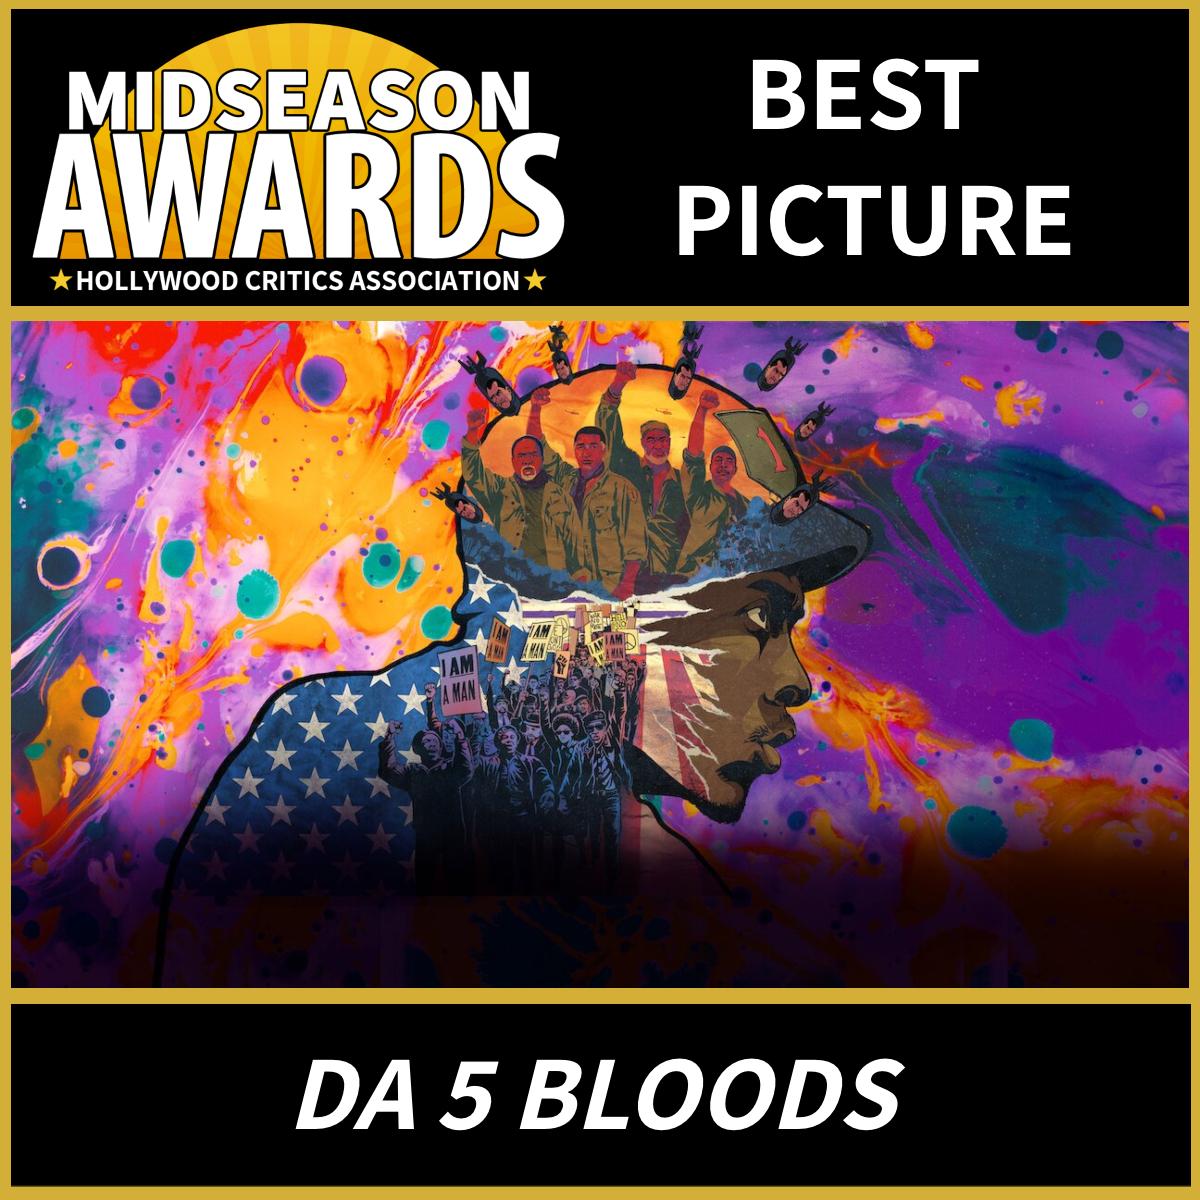 Spike Lee - Da 5 Bloods - Best Picture - Netflix